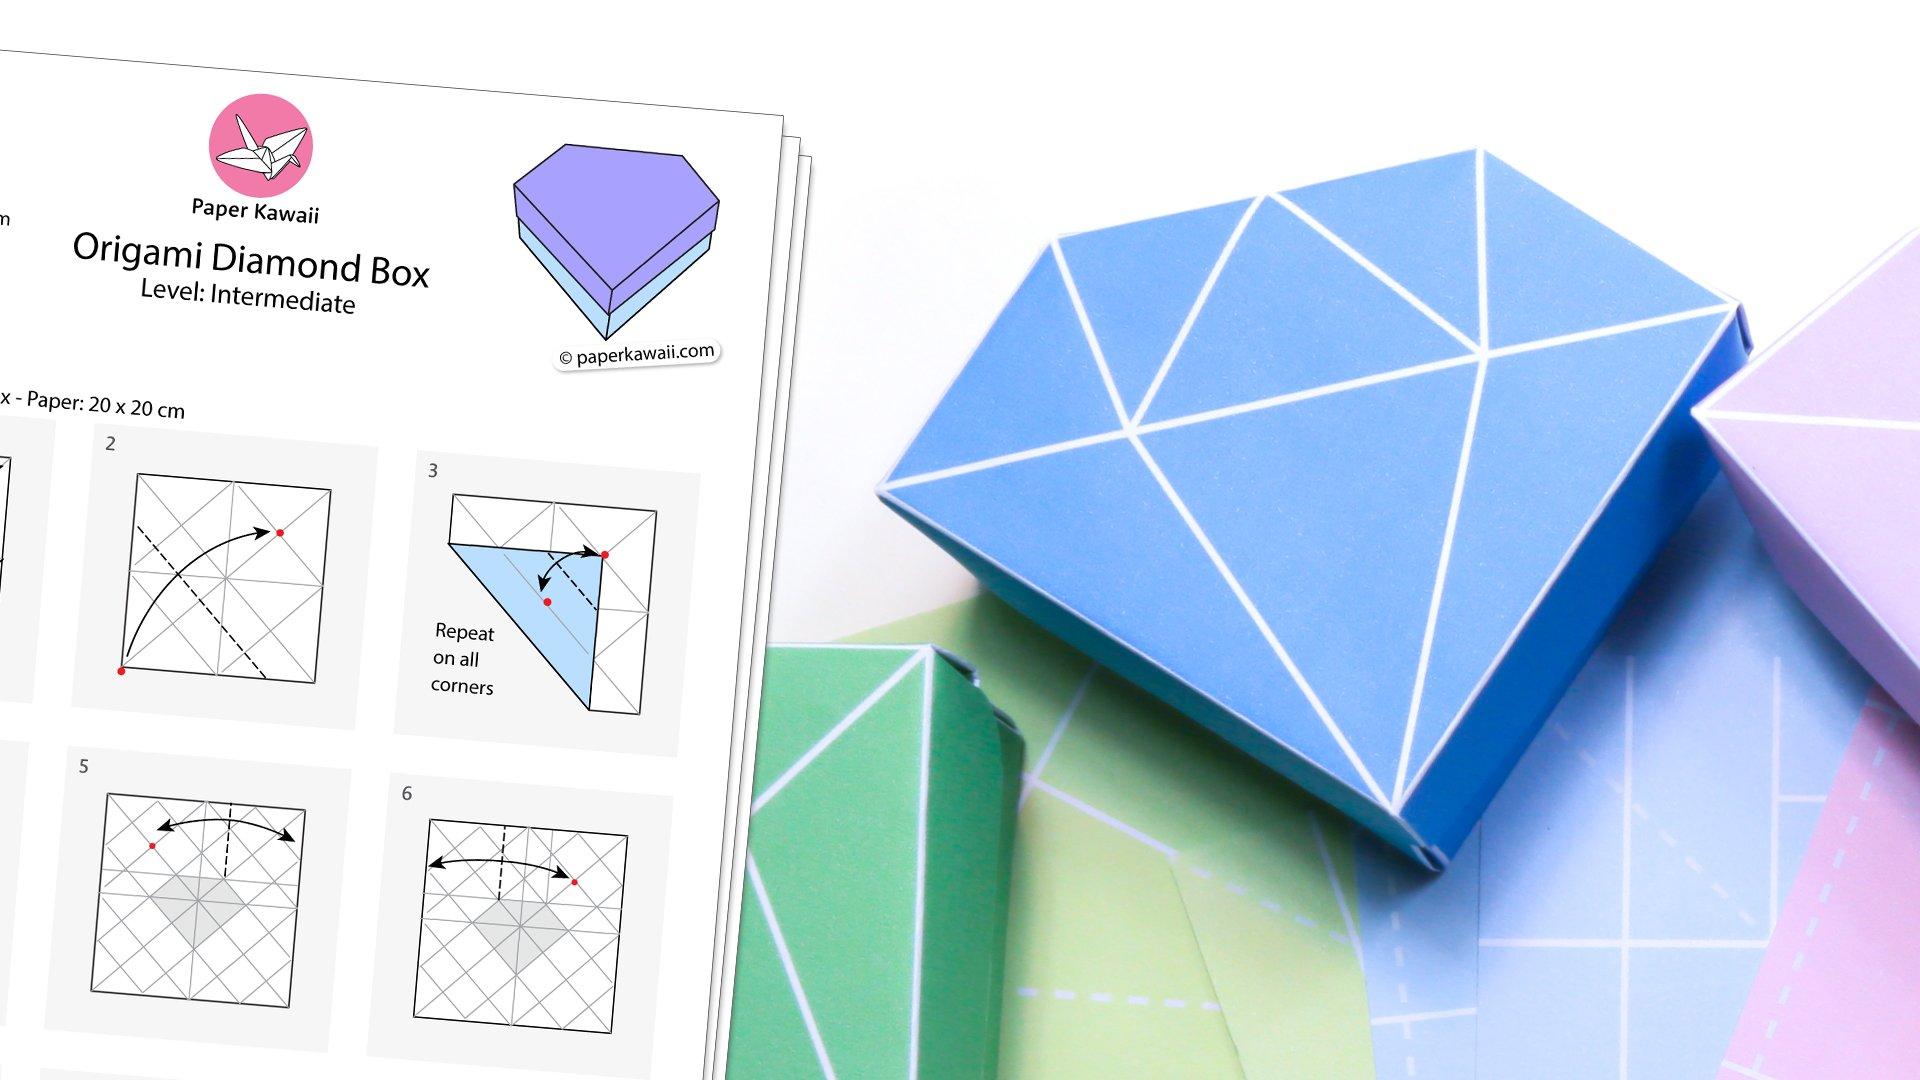 Origami Diamond Box Diagram & Printable Templates - Paper ... - photo#18